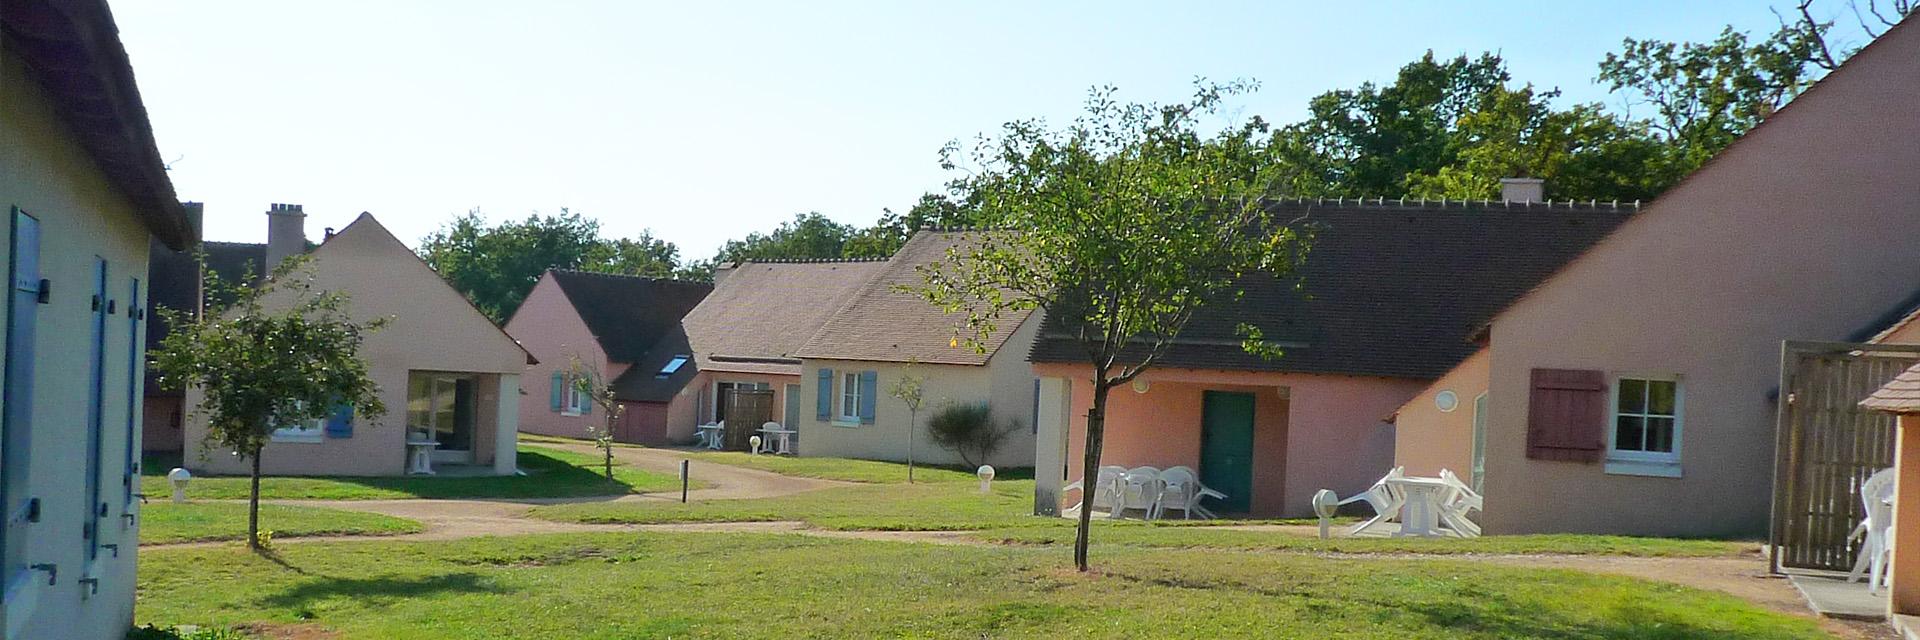 Destination Brenne - Domaine de Bellebouche